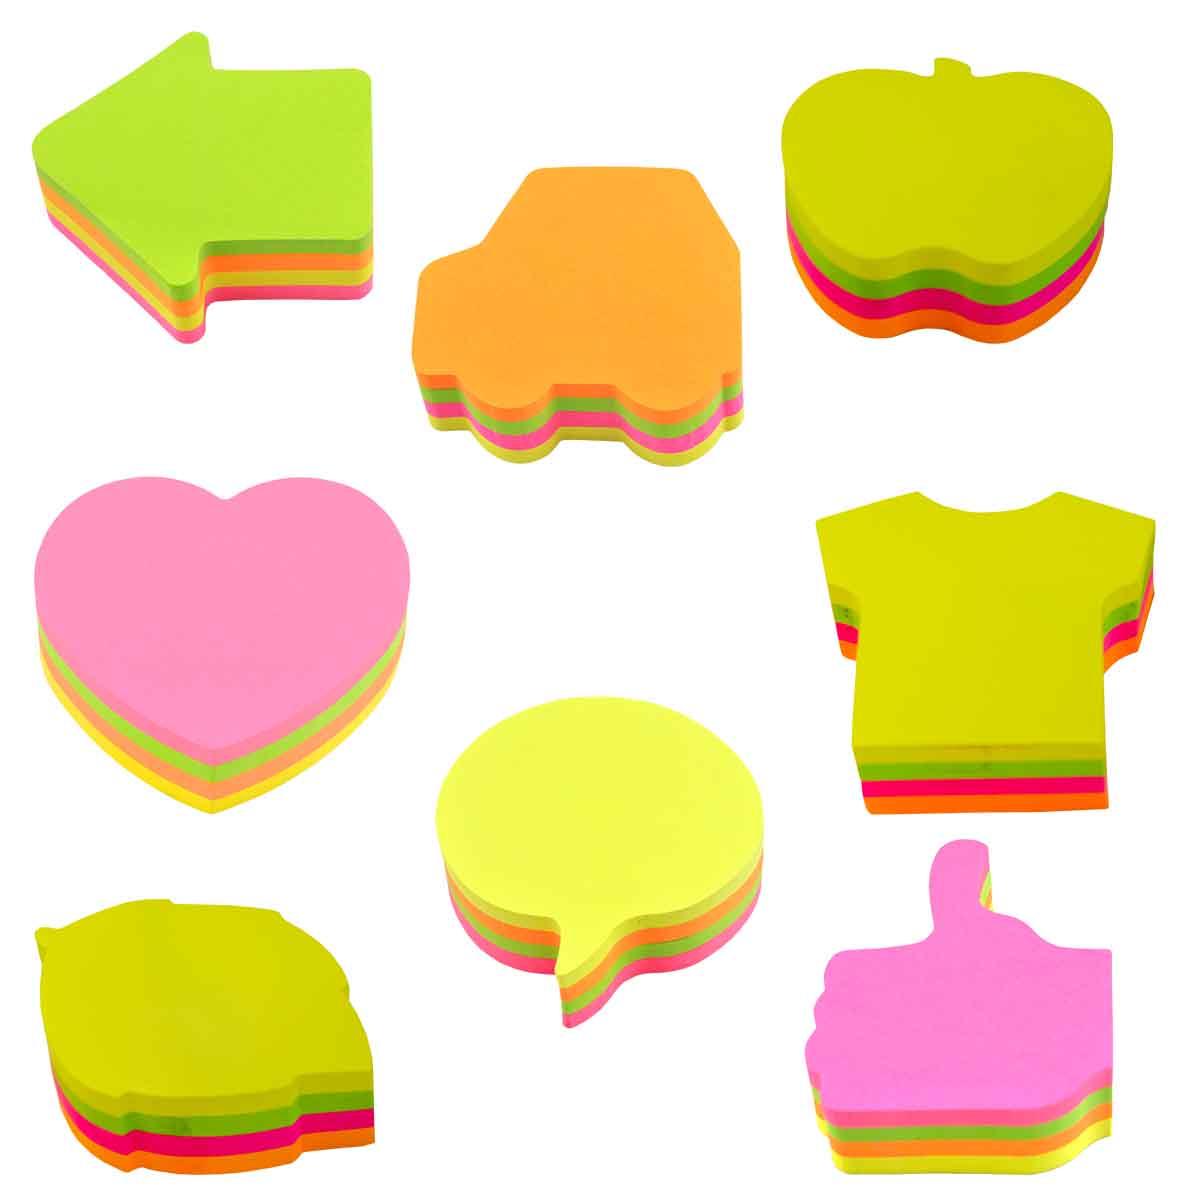 Haftnotiz-Würfel in verschiedenen Formen Image